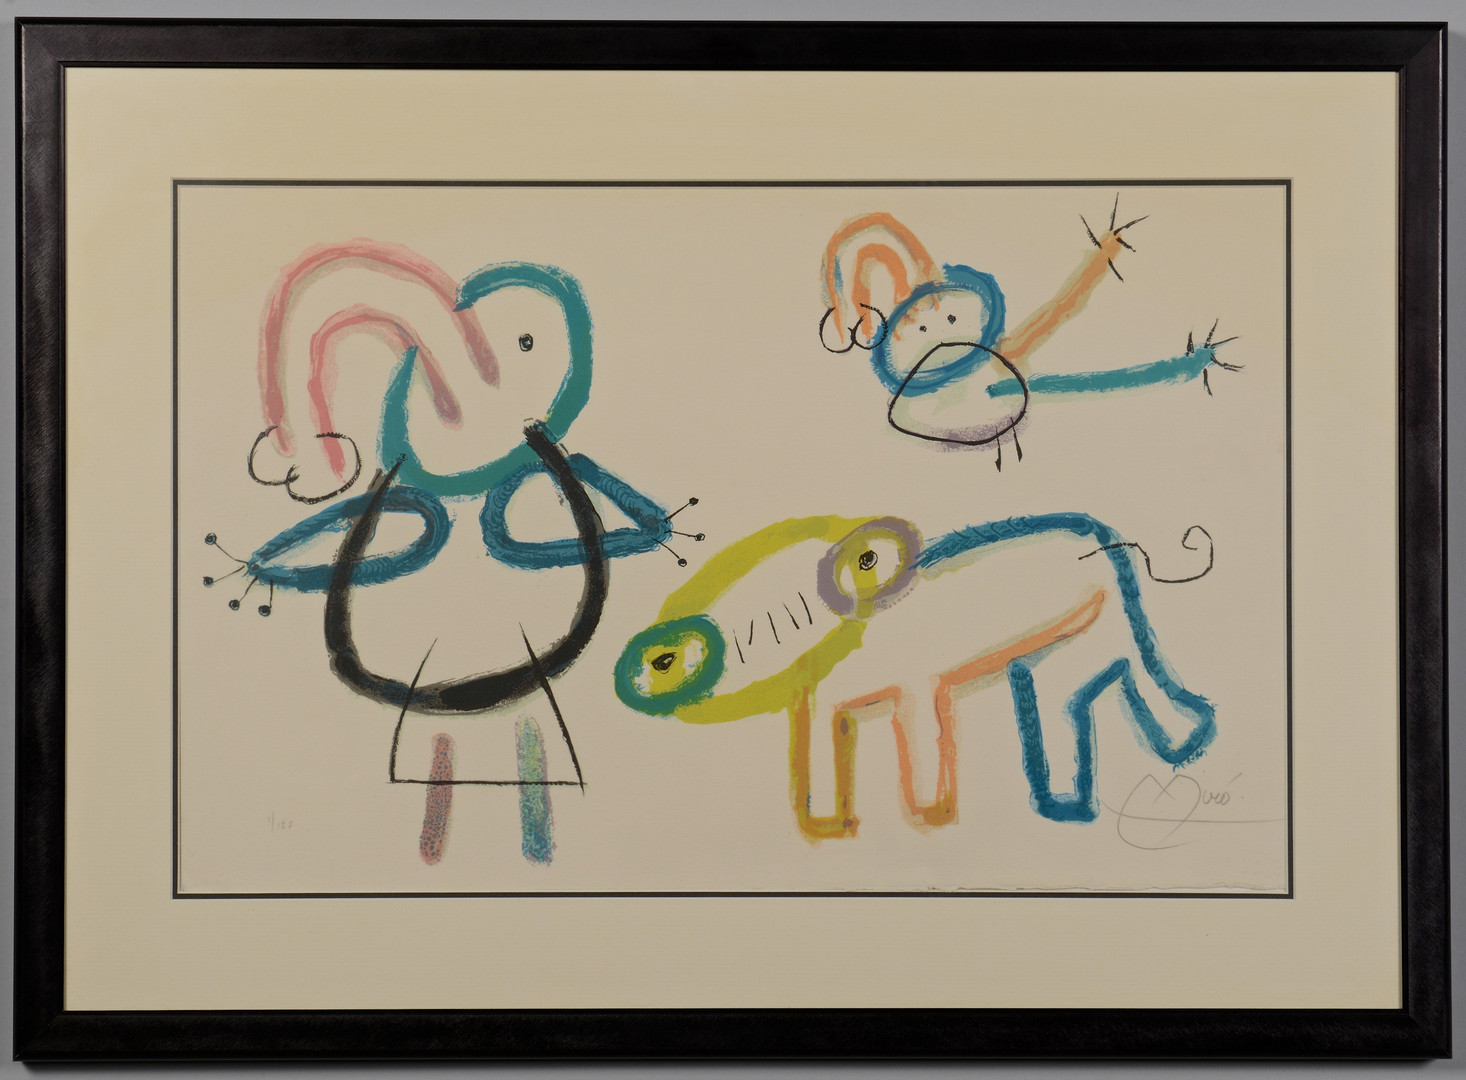 Lot 505: Joan Miro lithograph, L'Enfance D'Ubu